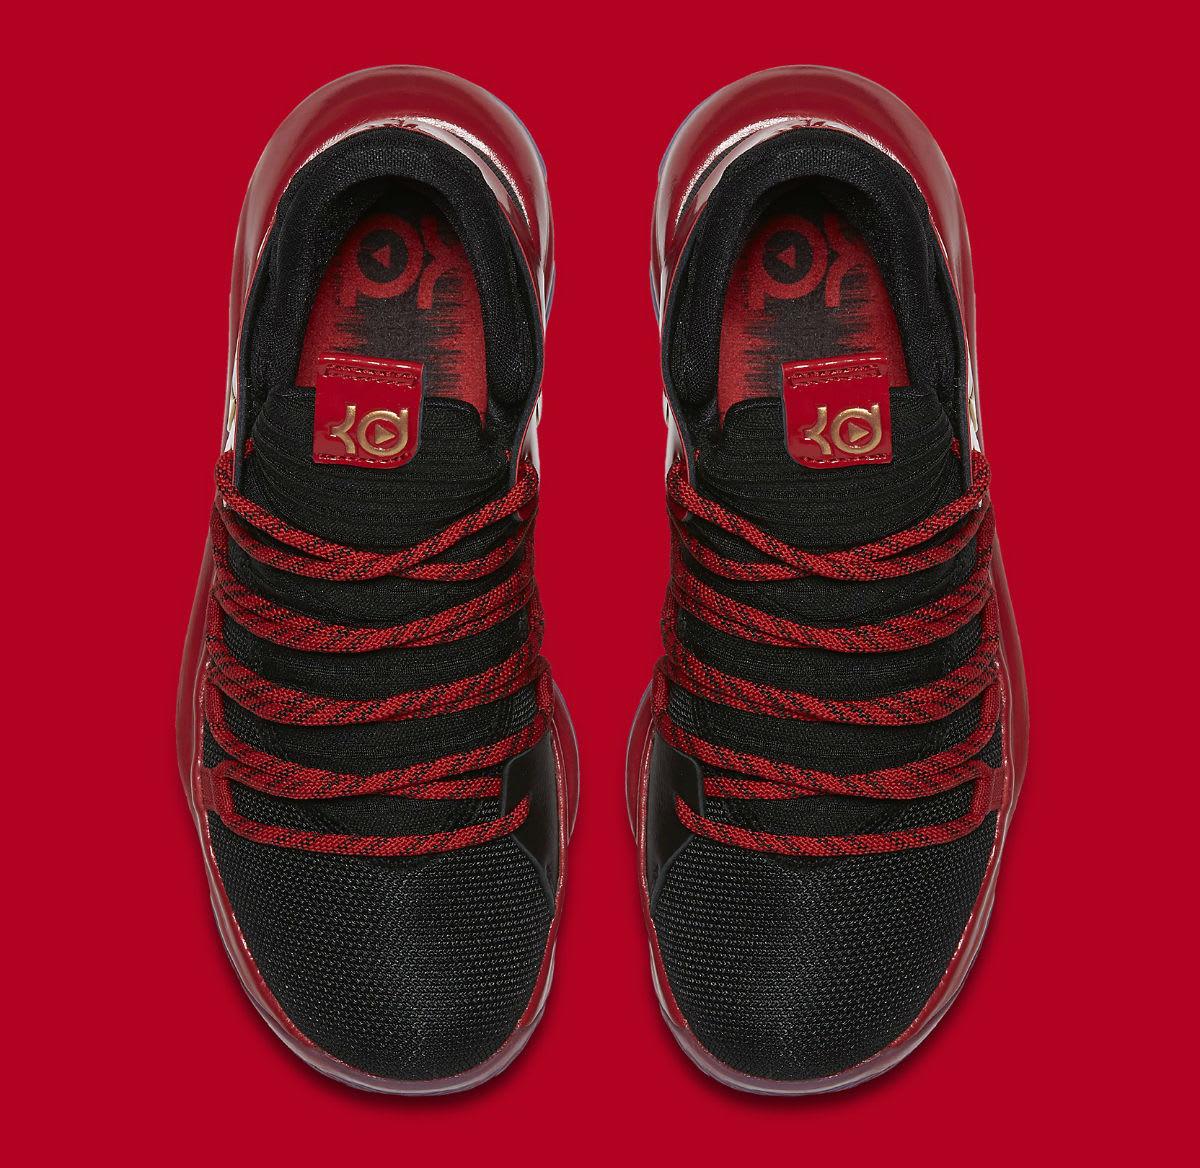 Nike KD 10 LE GS Black Metallic Gold University Red Bright Crimson Release Date AJ7220-076 Top